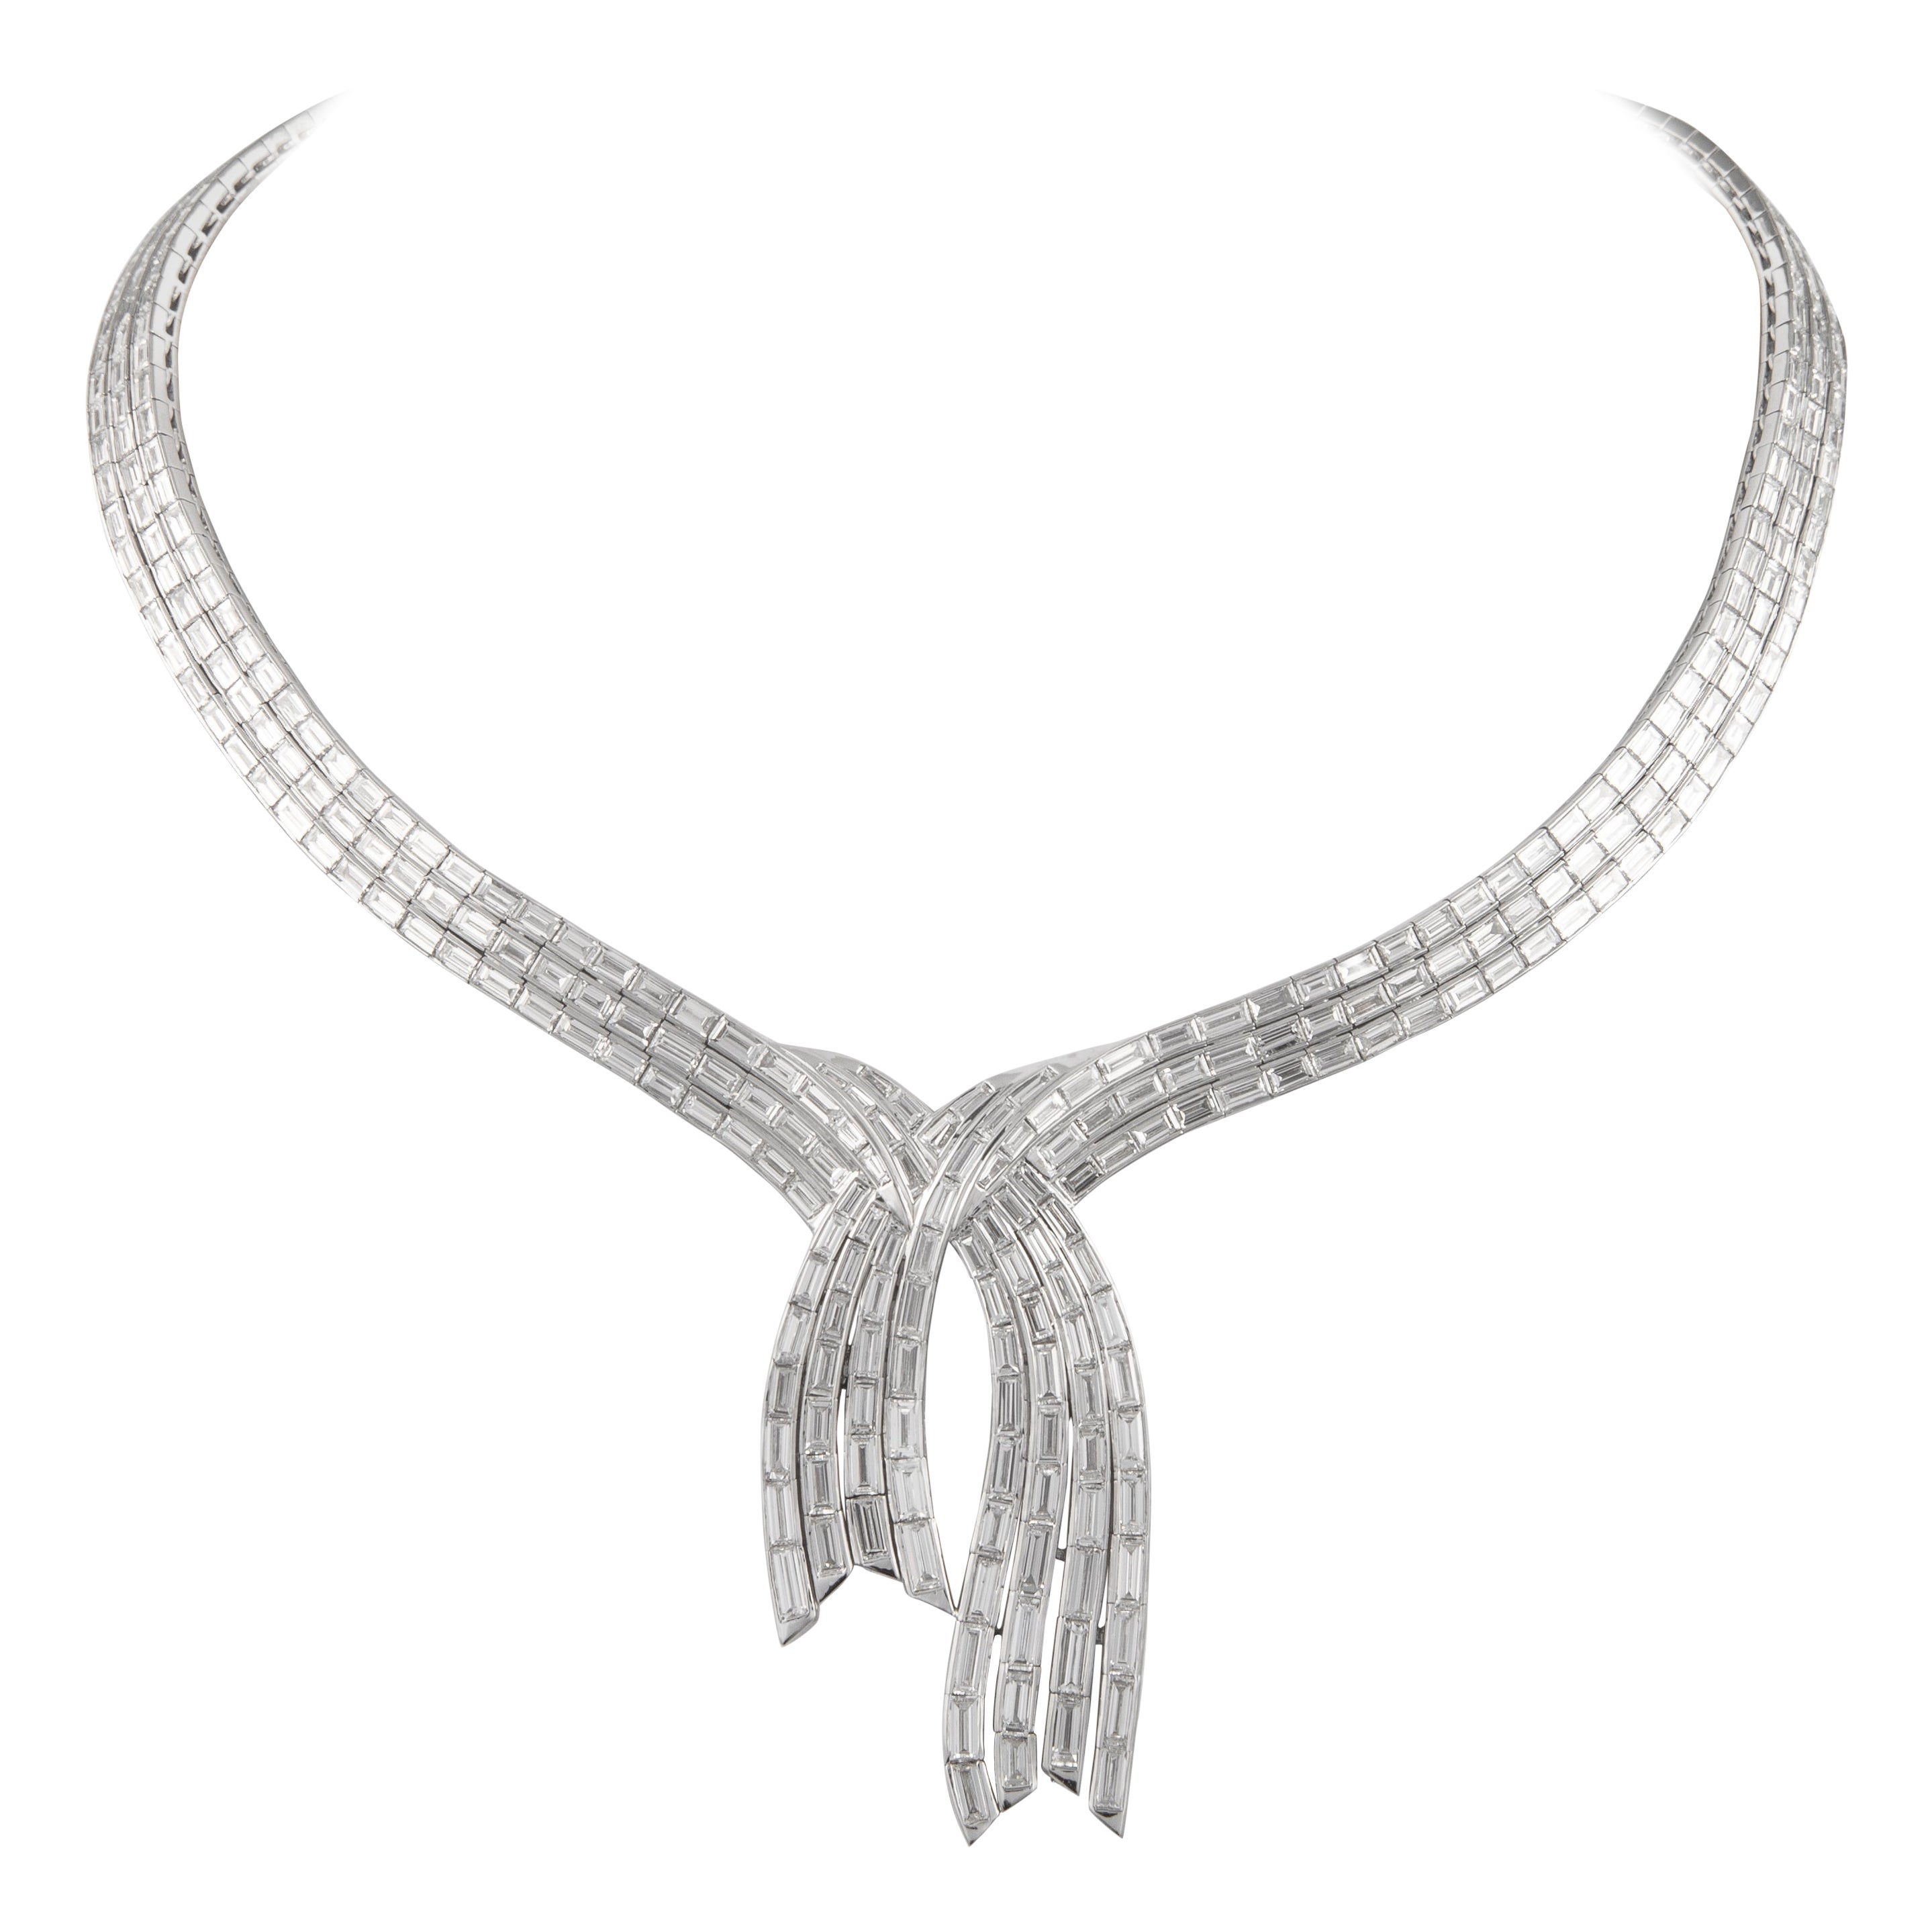 Alexander 31.55 Carat Baguette Cut Diamond 18 Karat White Gold Necklace